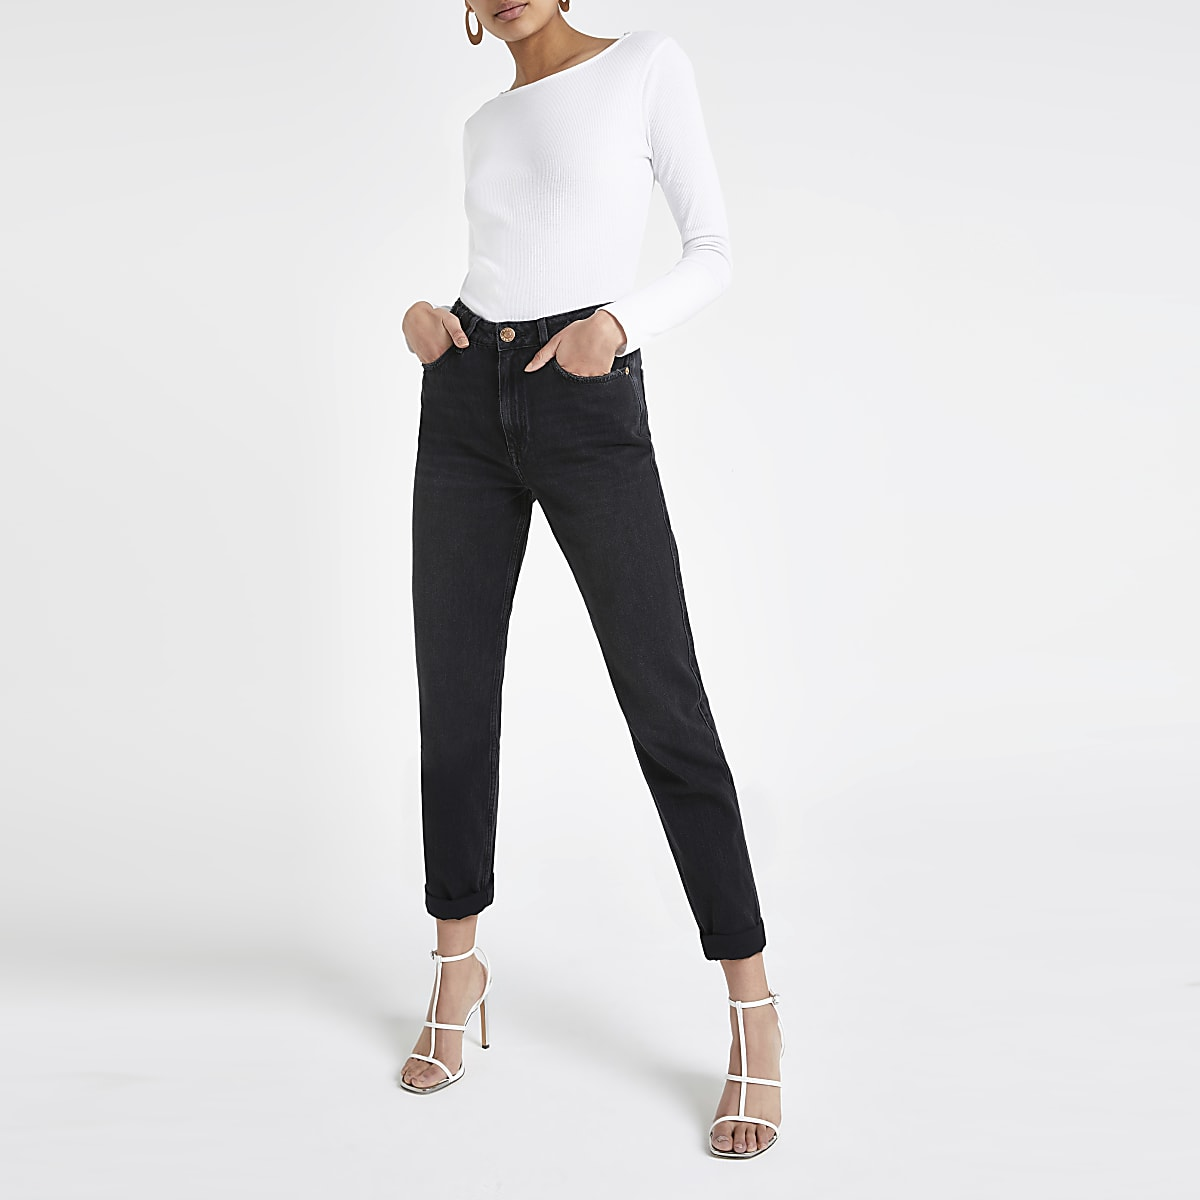 Zwarte mom jeans met hoge taille